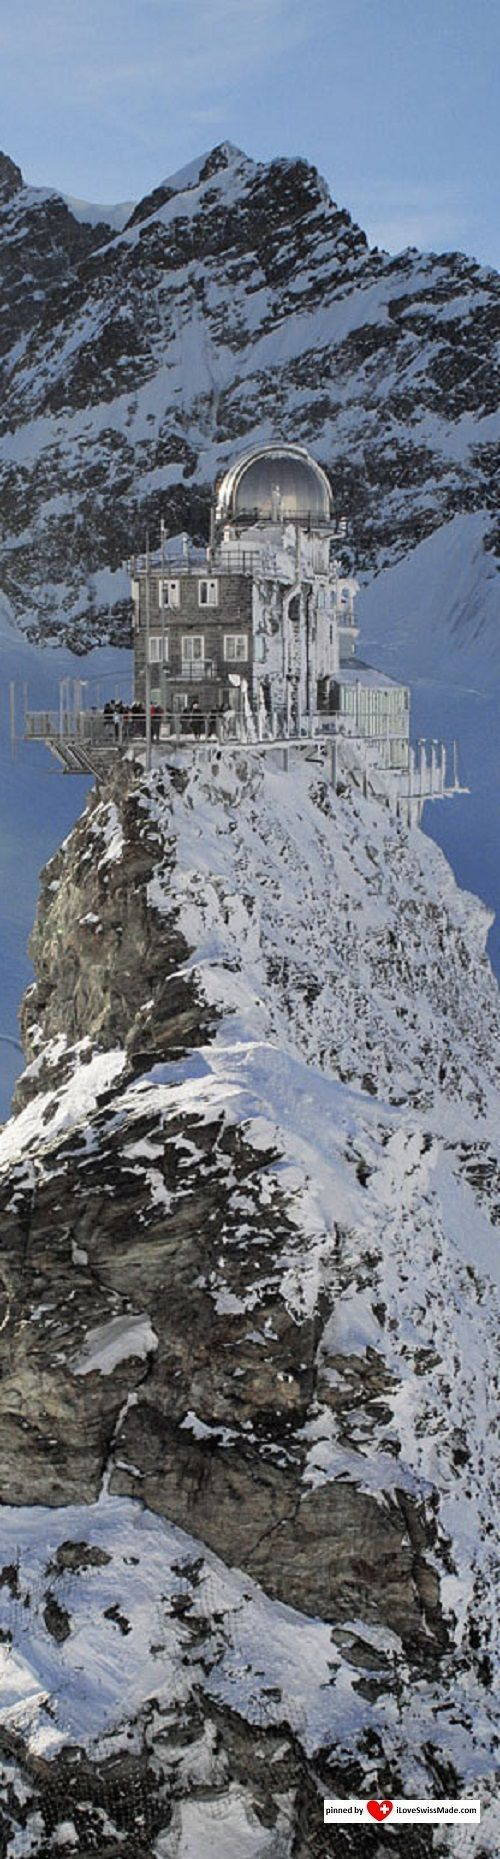 Jungfraujoch Top of Europe. Photo Jungfrau.ch, adapted to Pinterest by iLoveSwissMade.com